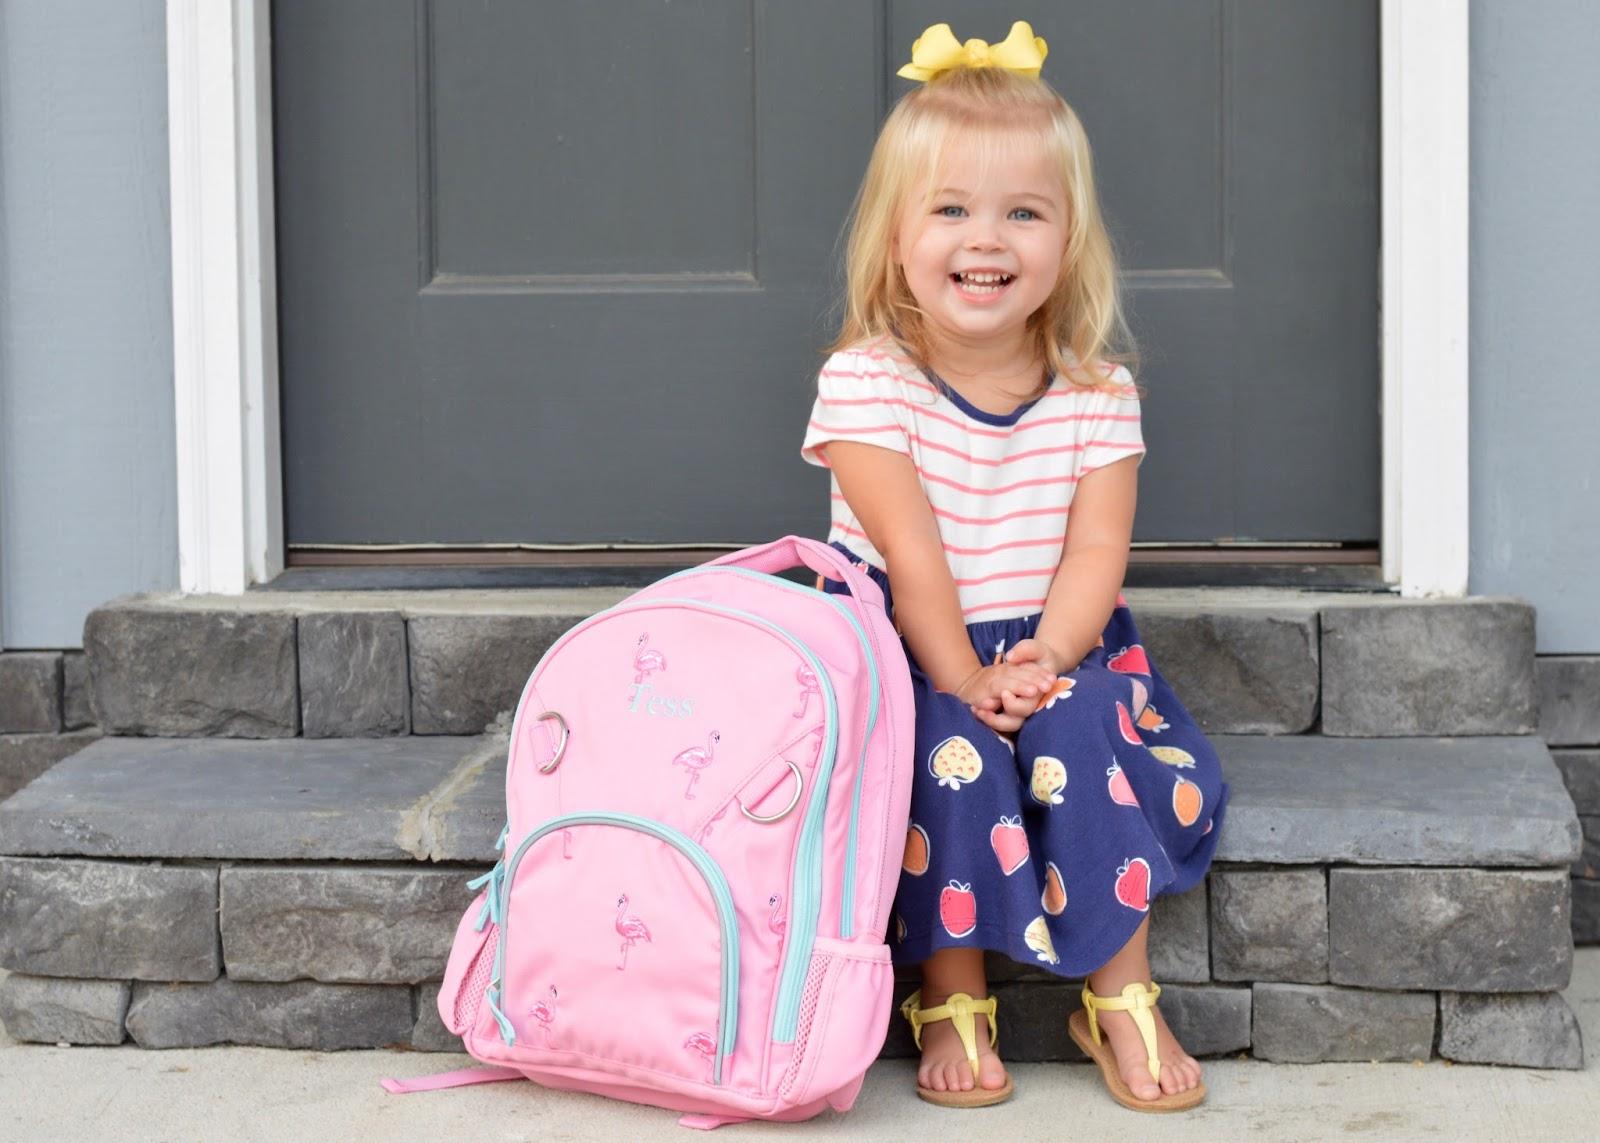 Tess's School Decision